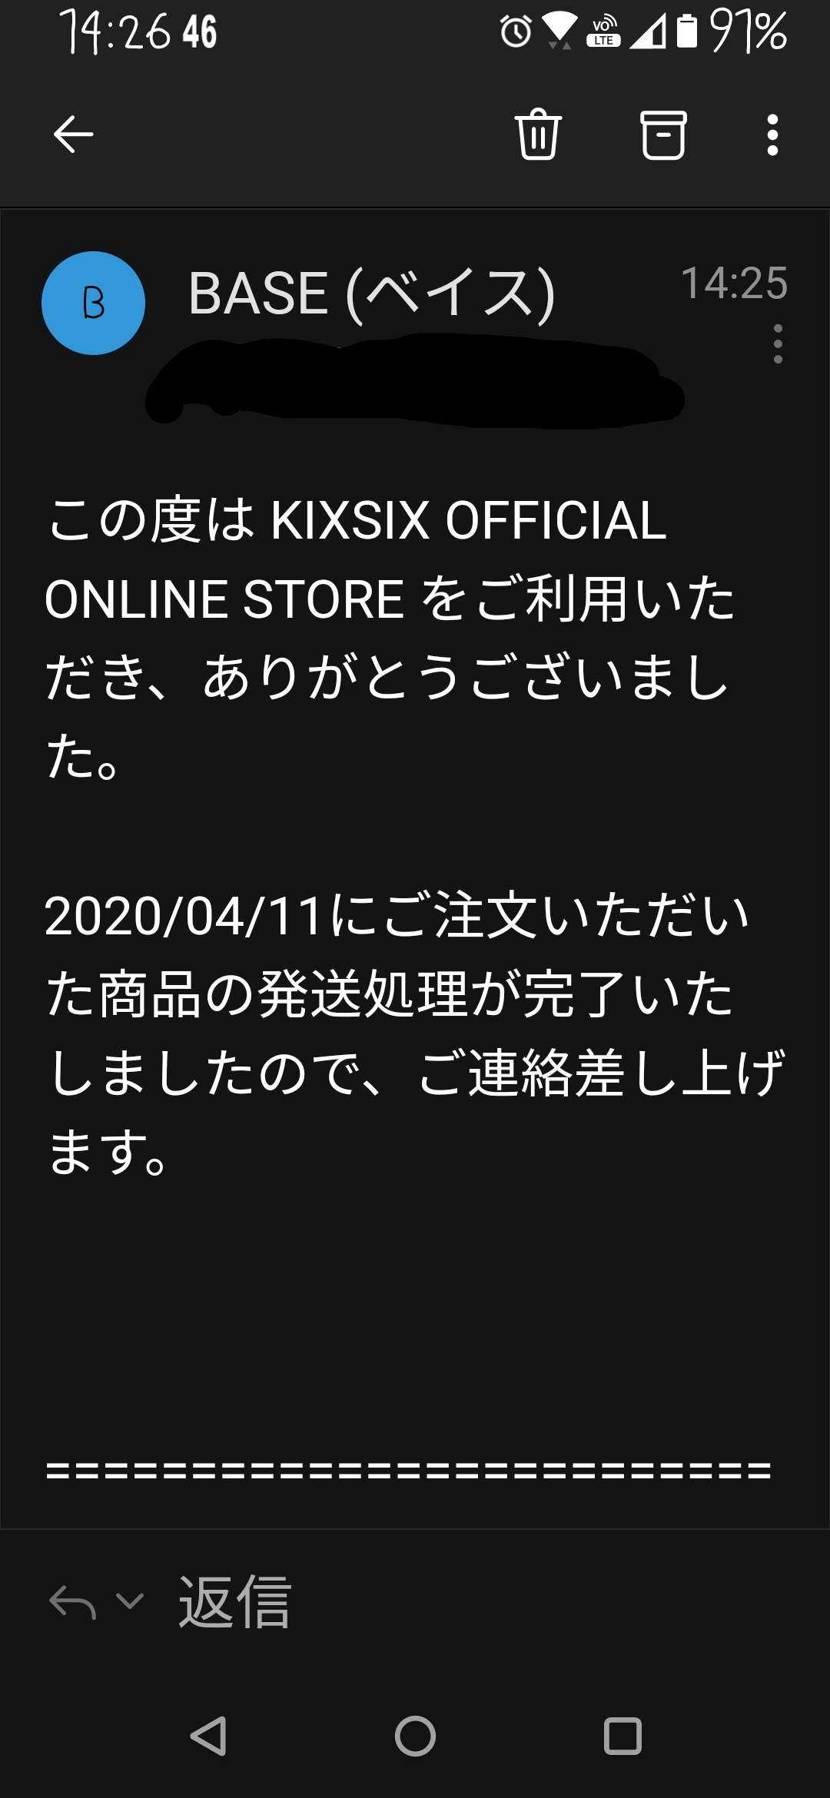 KIXSIXさん 仕事早いです! もう発送になりました。😆